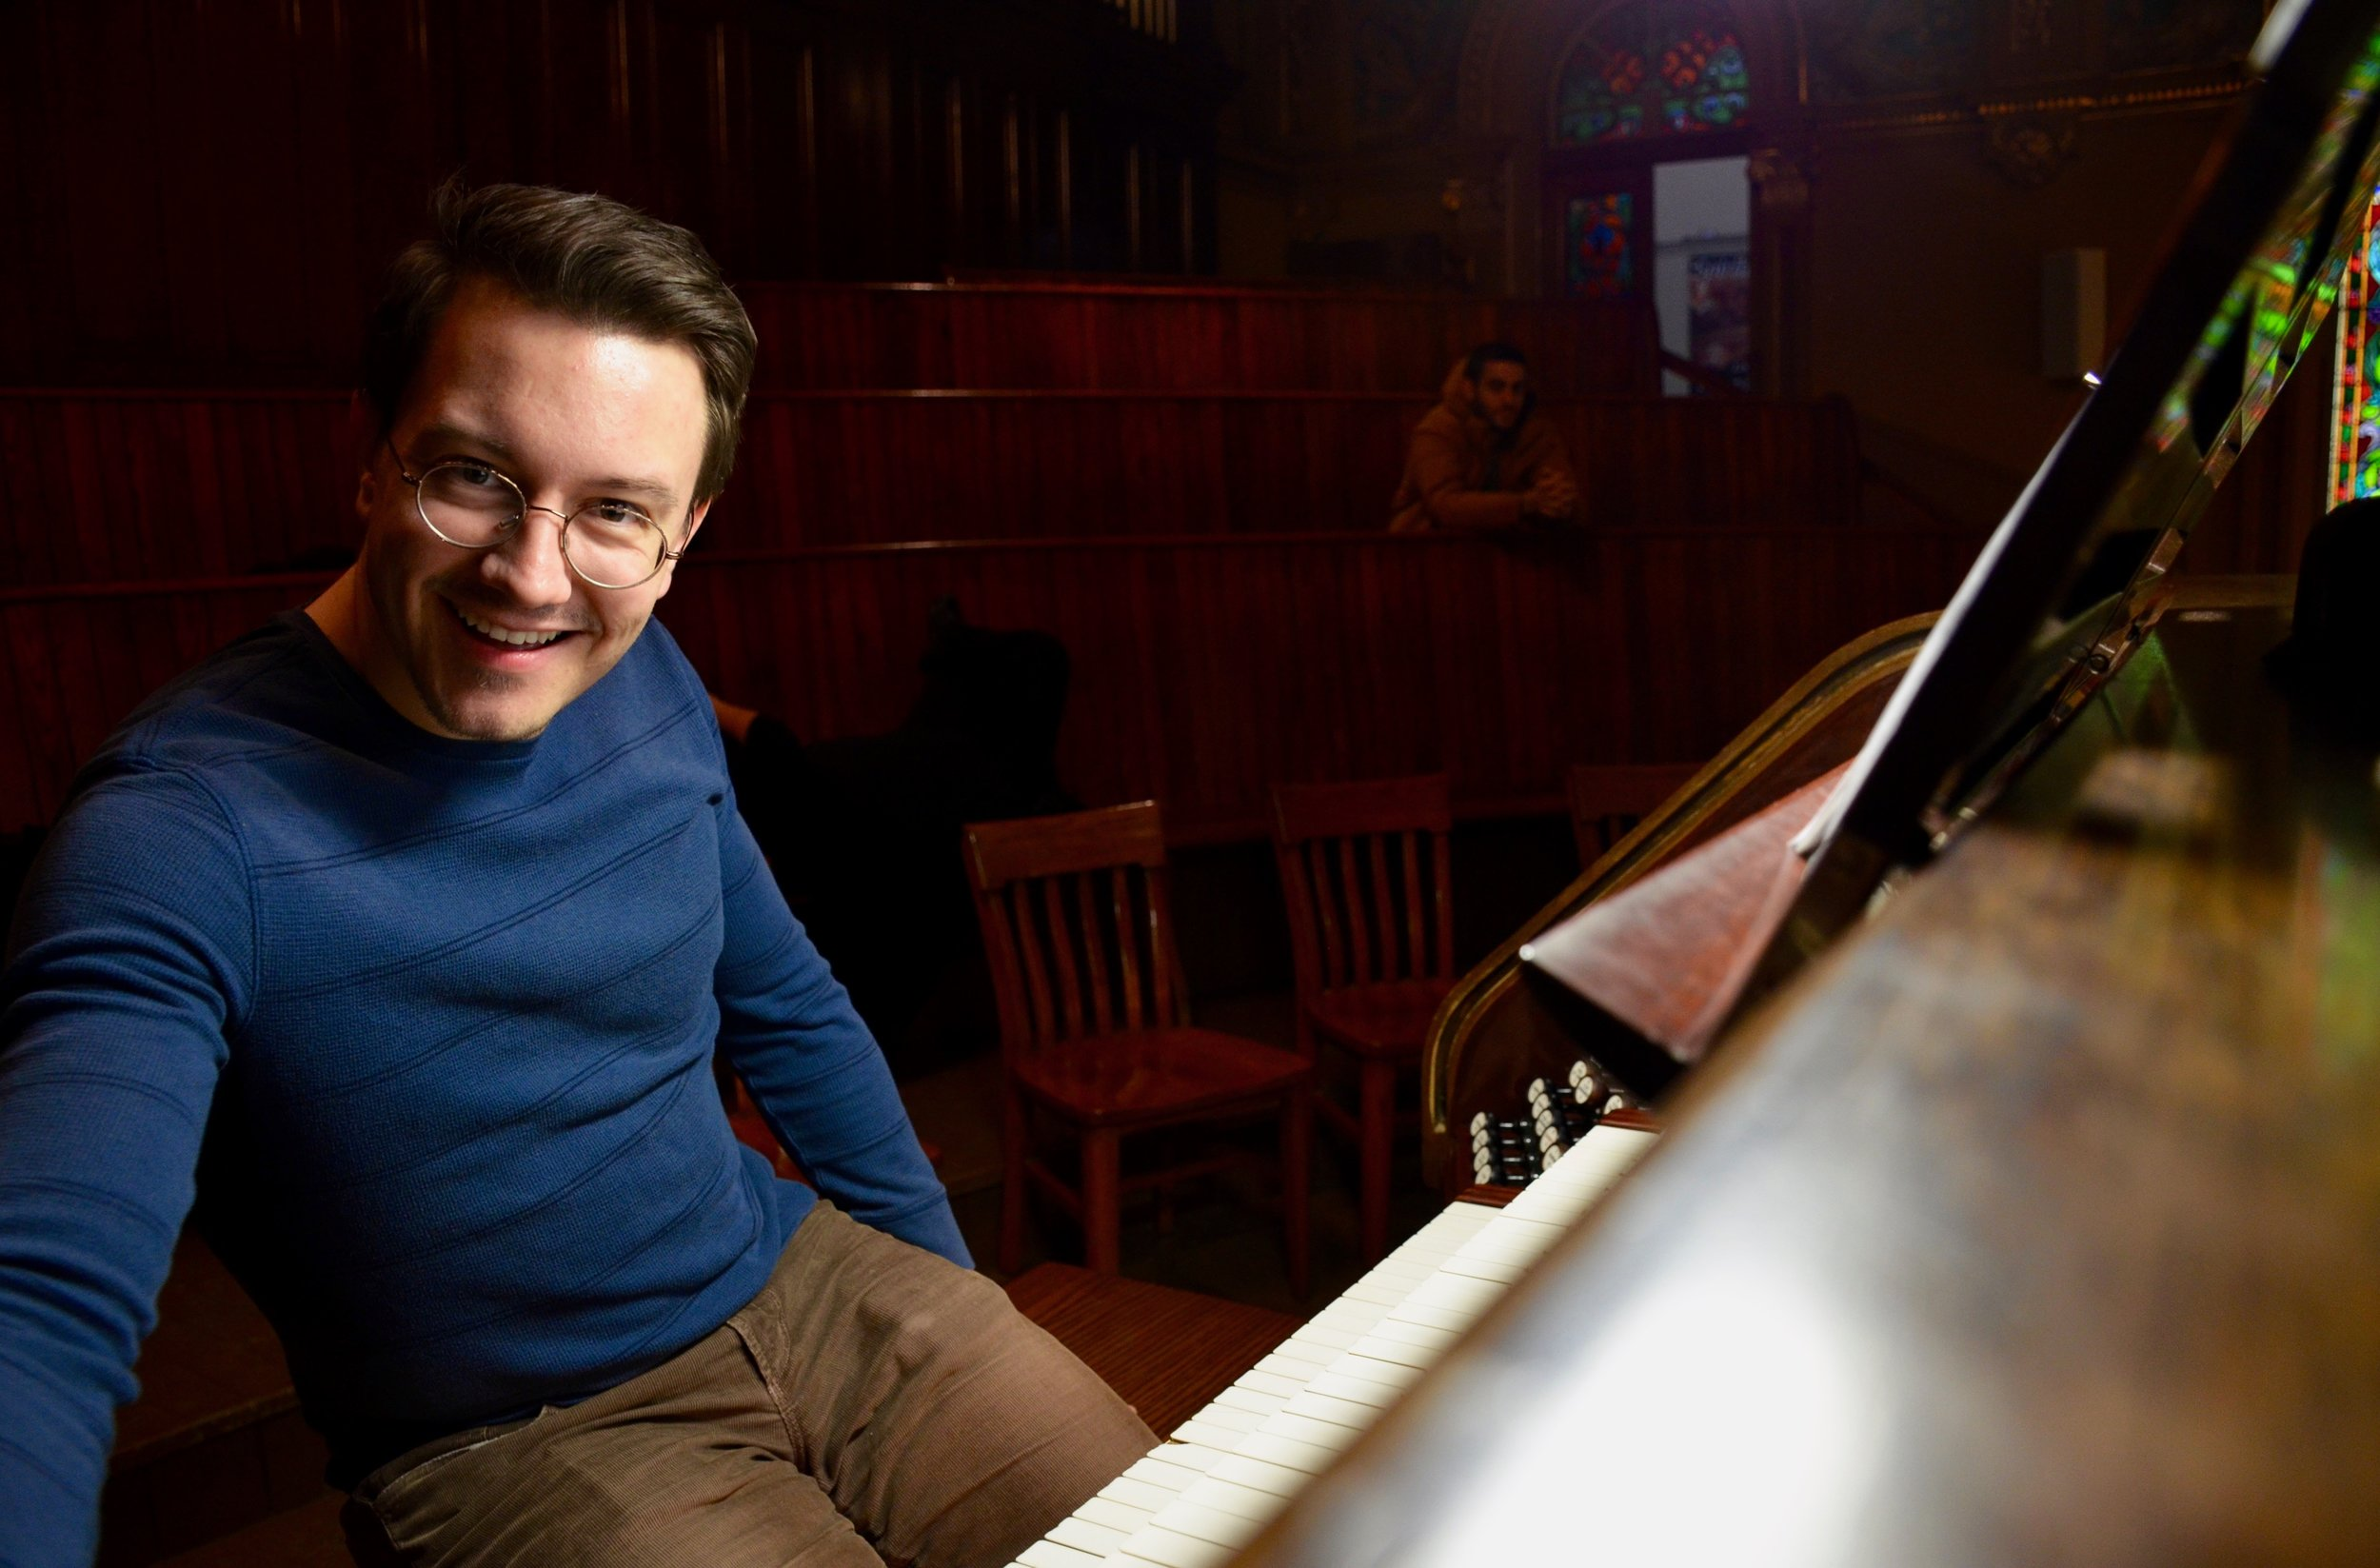 Corey de Tar plays the Casavant organ, Eglise St-Jean Baptiste, Montreal